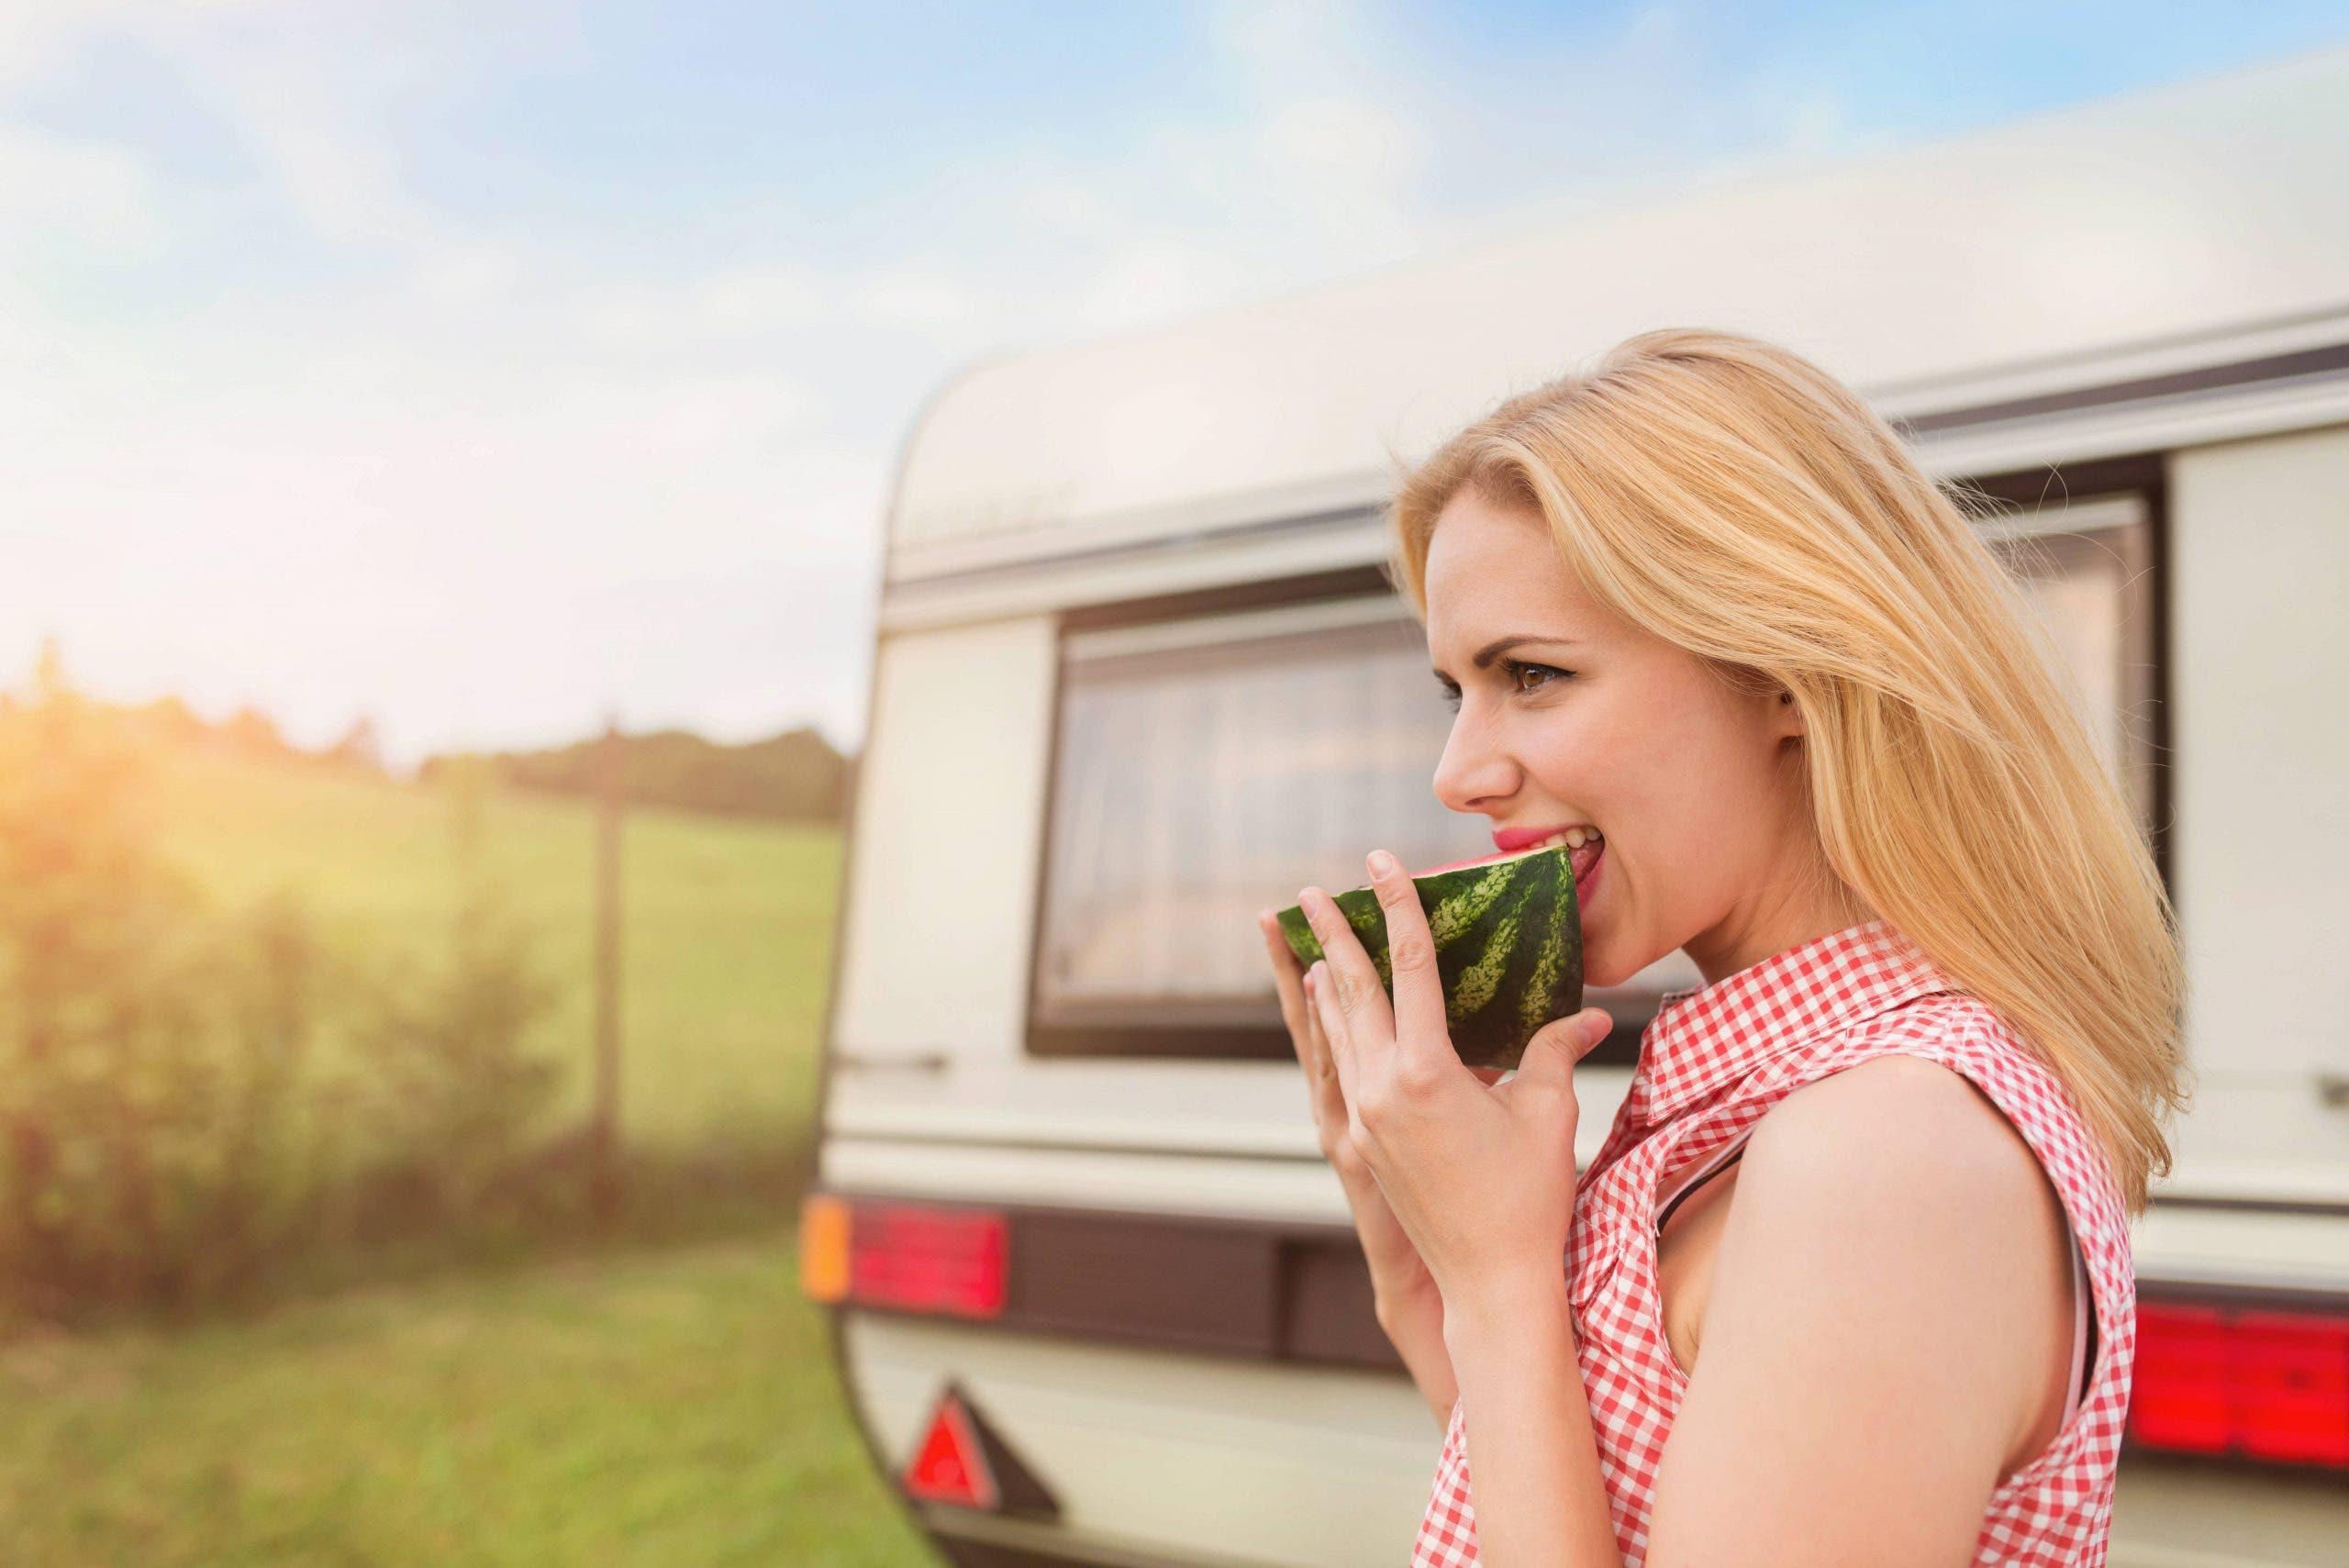 Beautiful Woman Outside The Camper Van